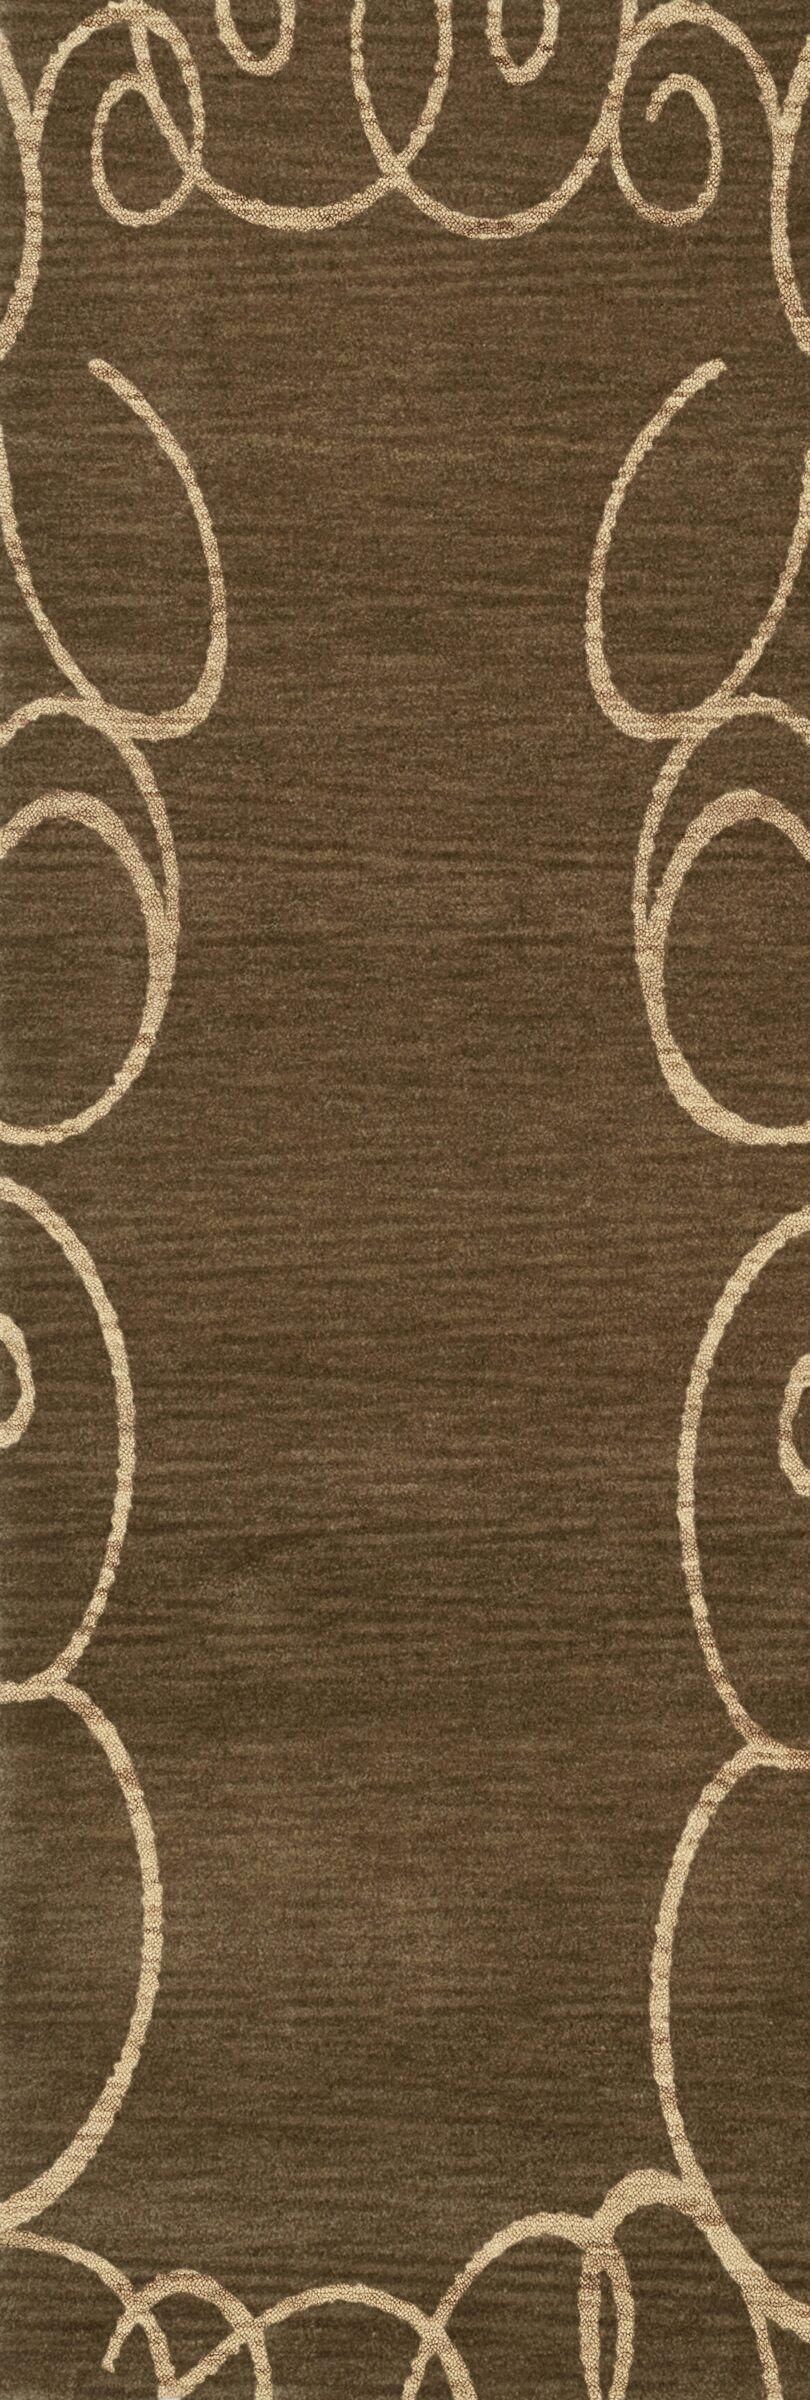 Bella Machine Woven Wool Brown Area Rug Rug Size: Runner 2'6